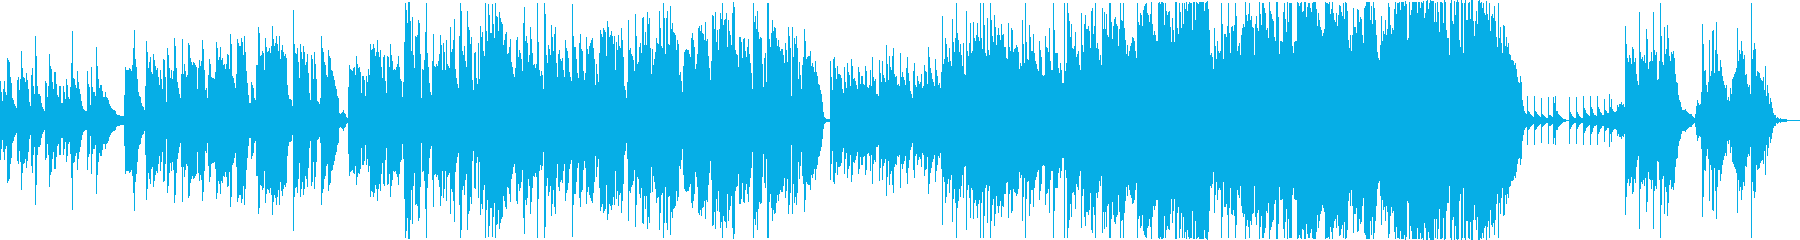 C-POPでリラックスな曲の再生済みの波形